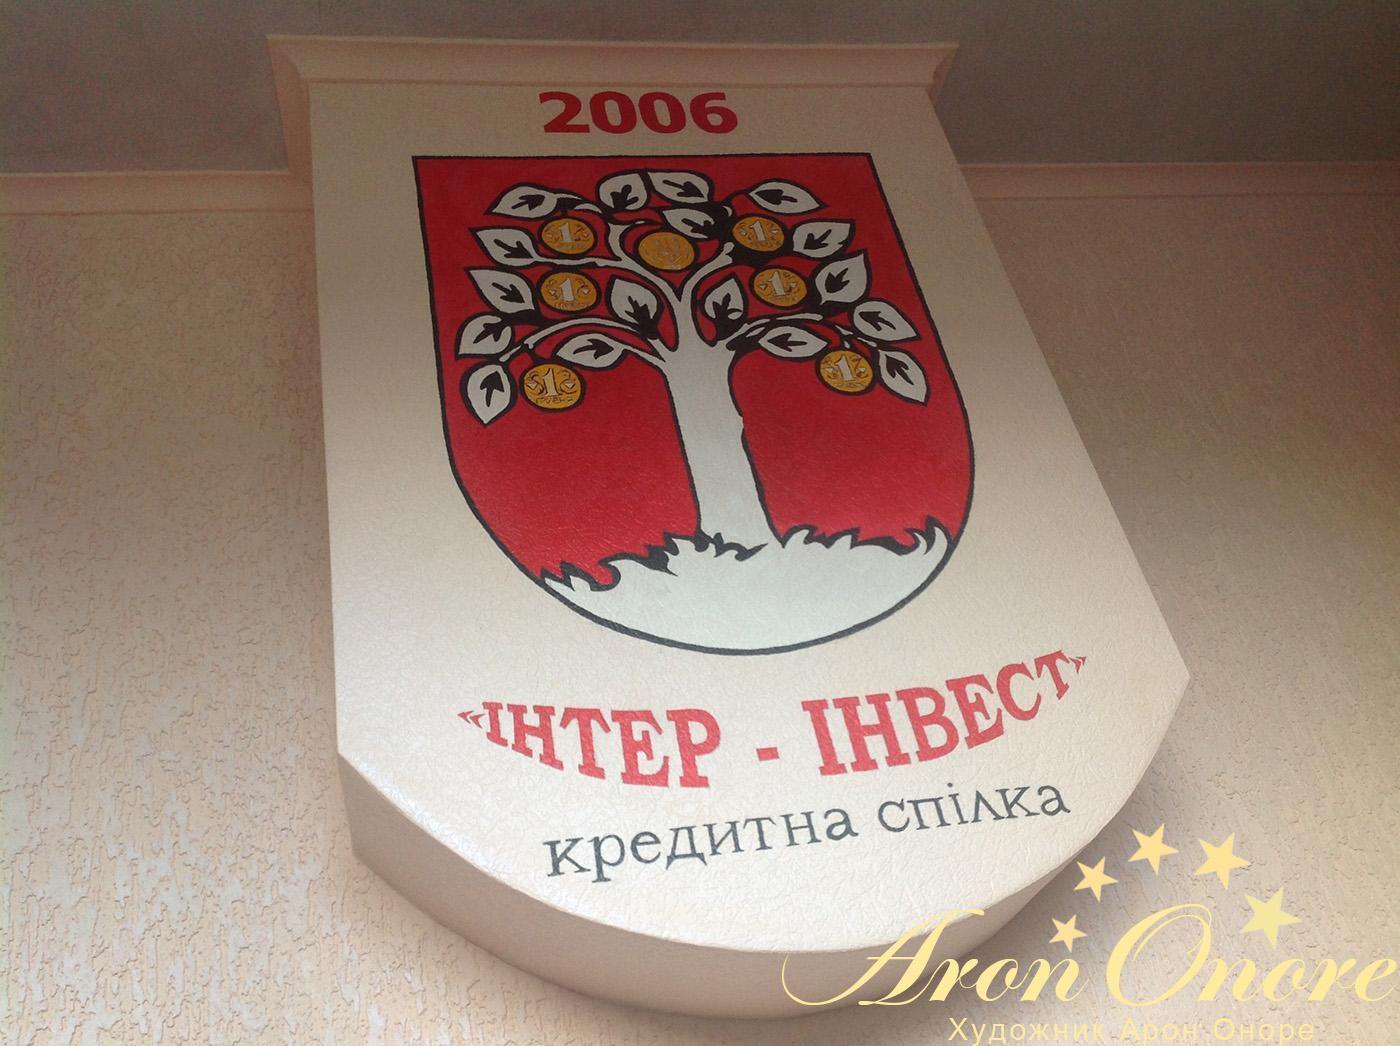 Художественный логотип компании Интер Инвест